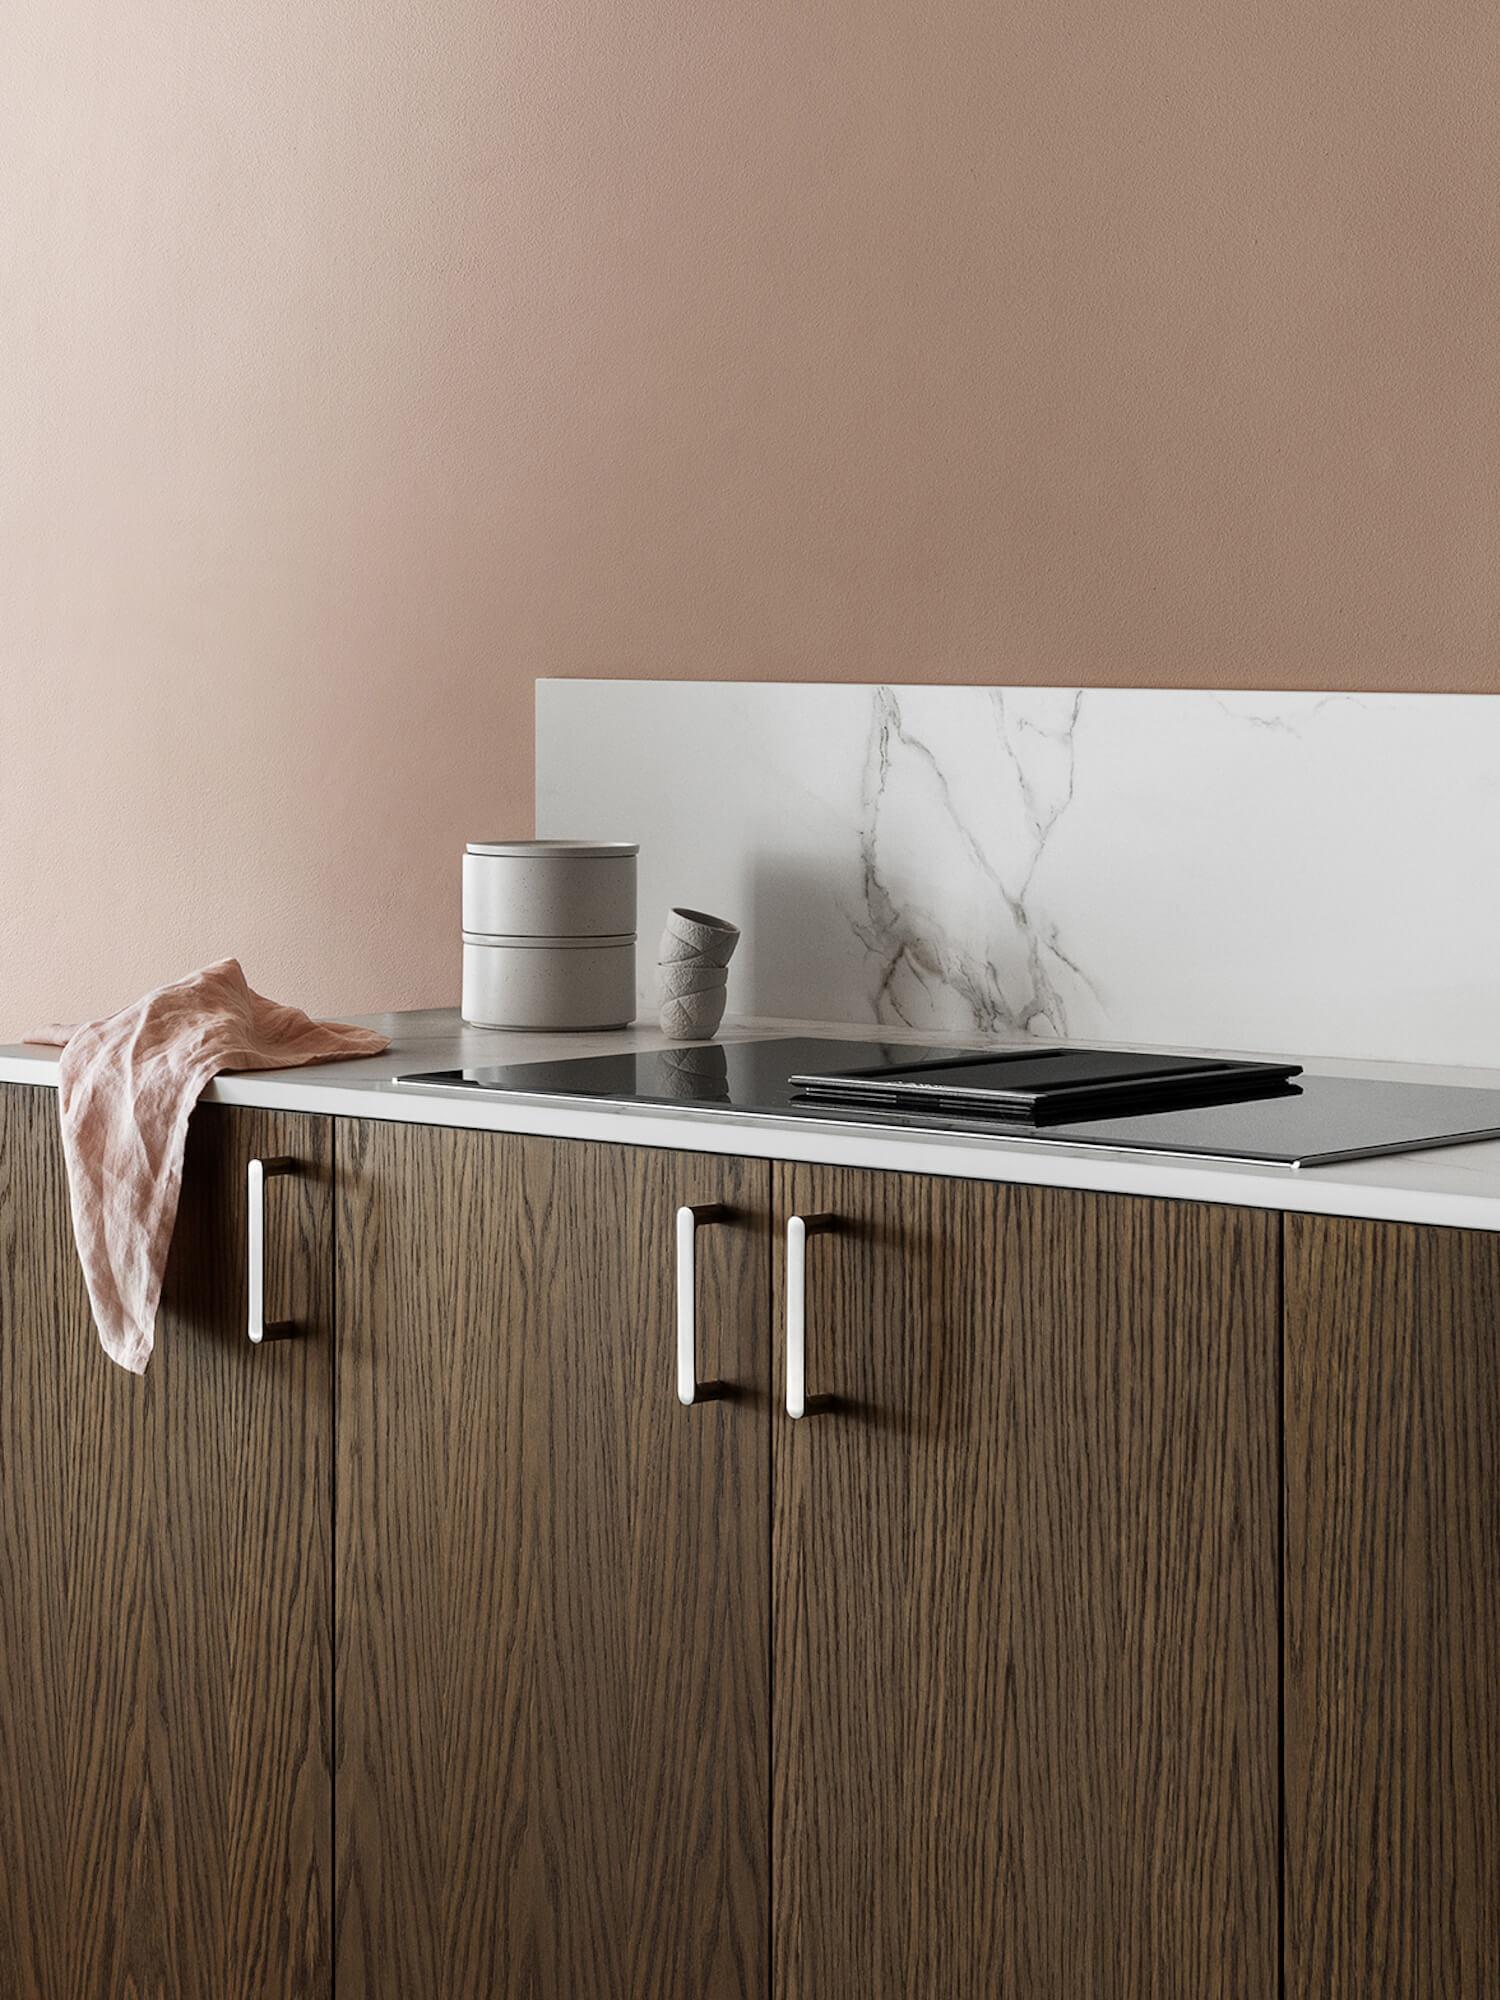 Food Pharmacy Kitchen by Nordiska Kok | Designing a Nordic-Style Kitchen | Cosentino